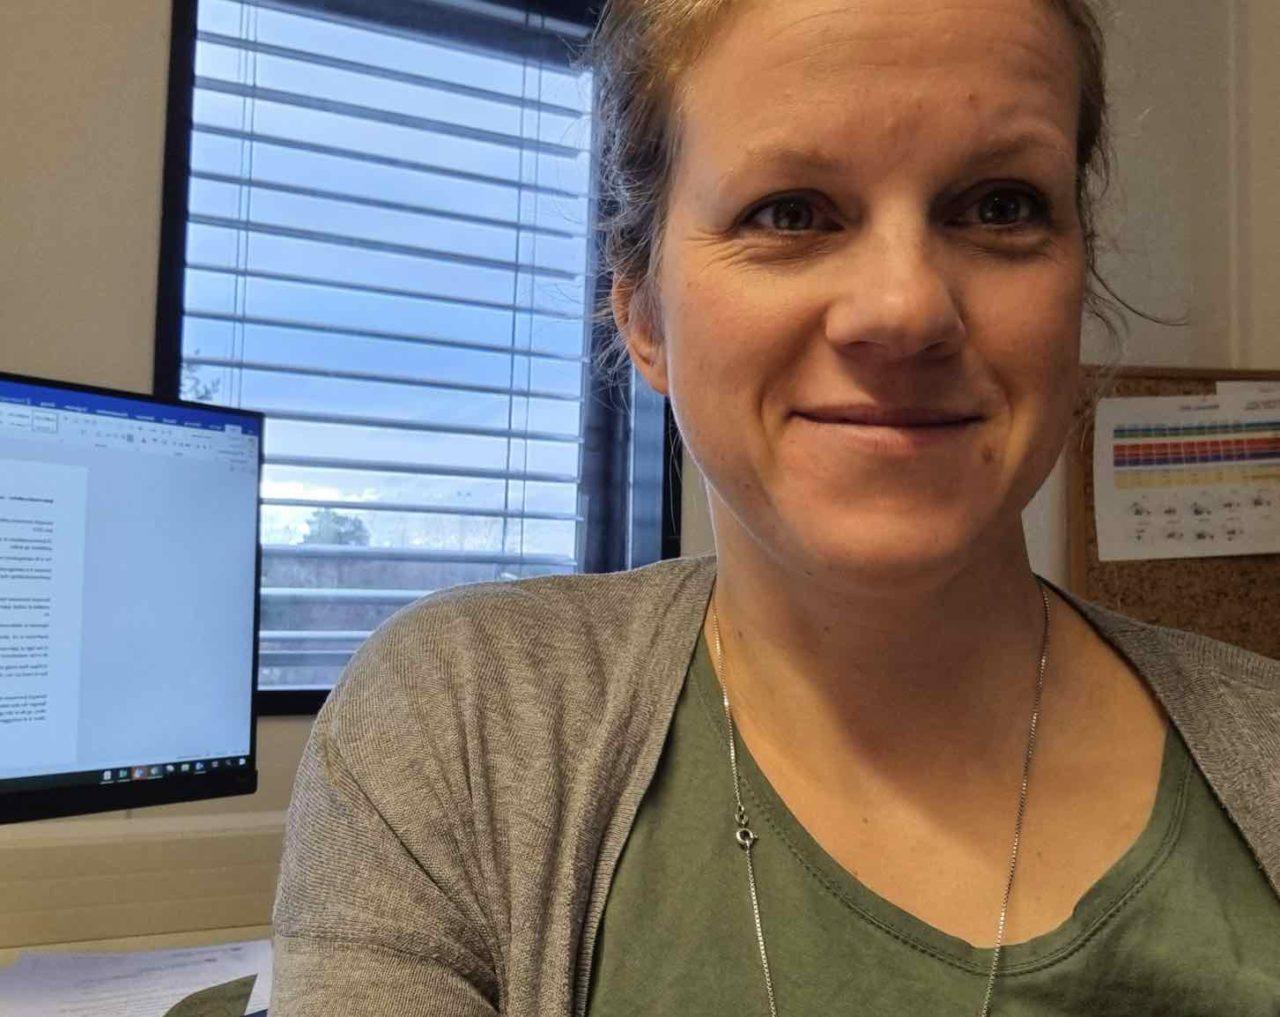 Kristin-Norbye-Bekkelund-1280x1017.jpg